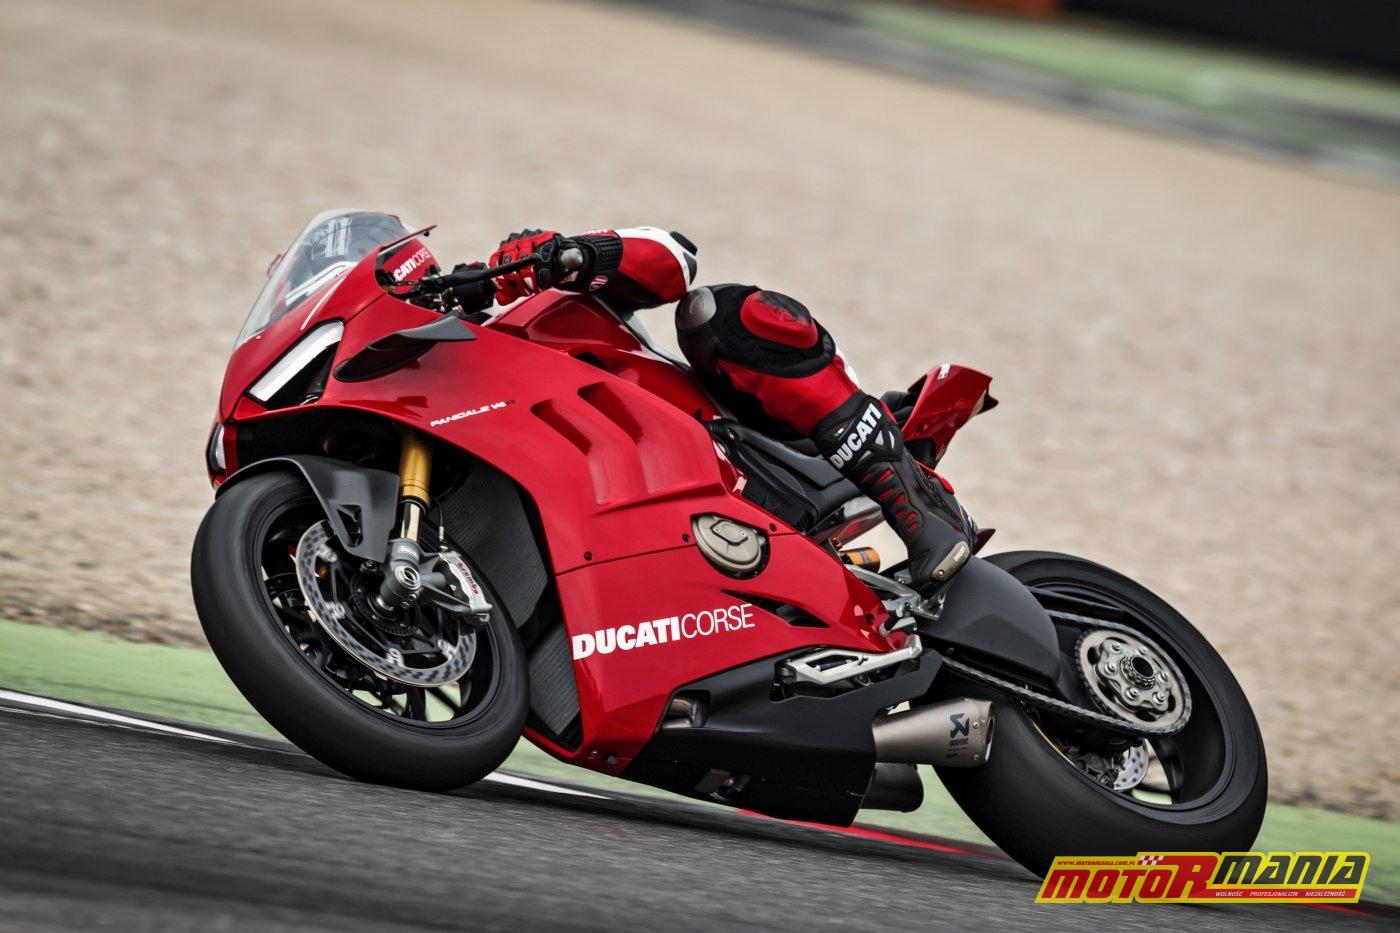 Ducati Panigale V4 R 2019 (24)